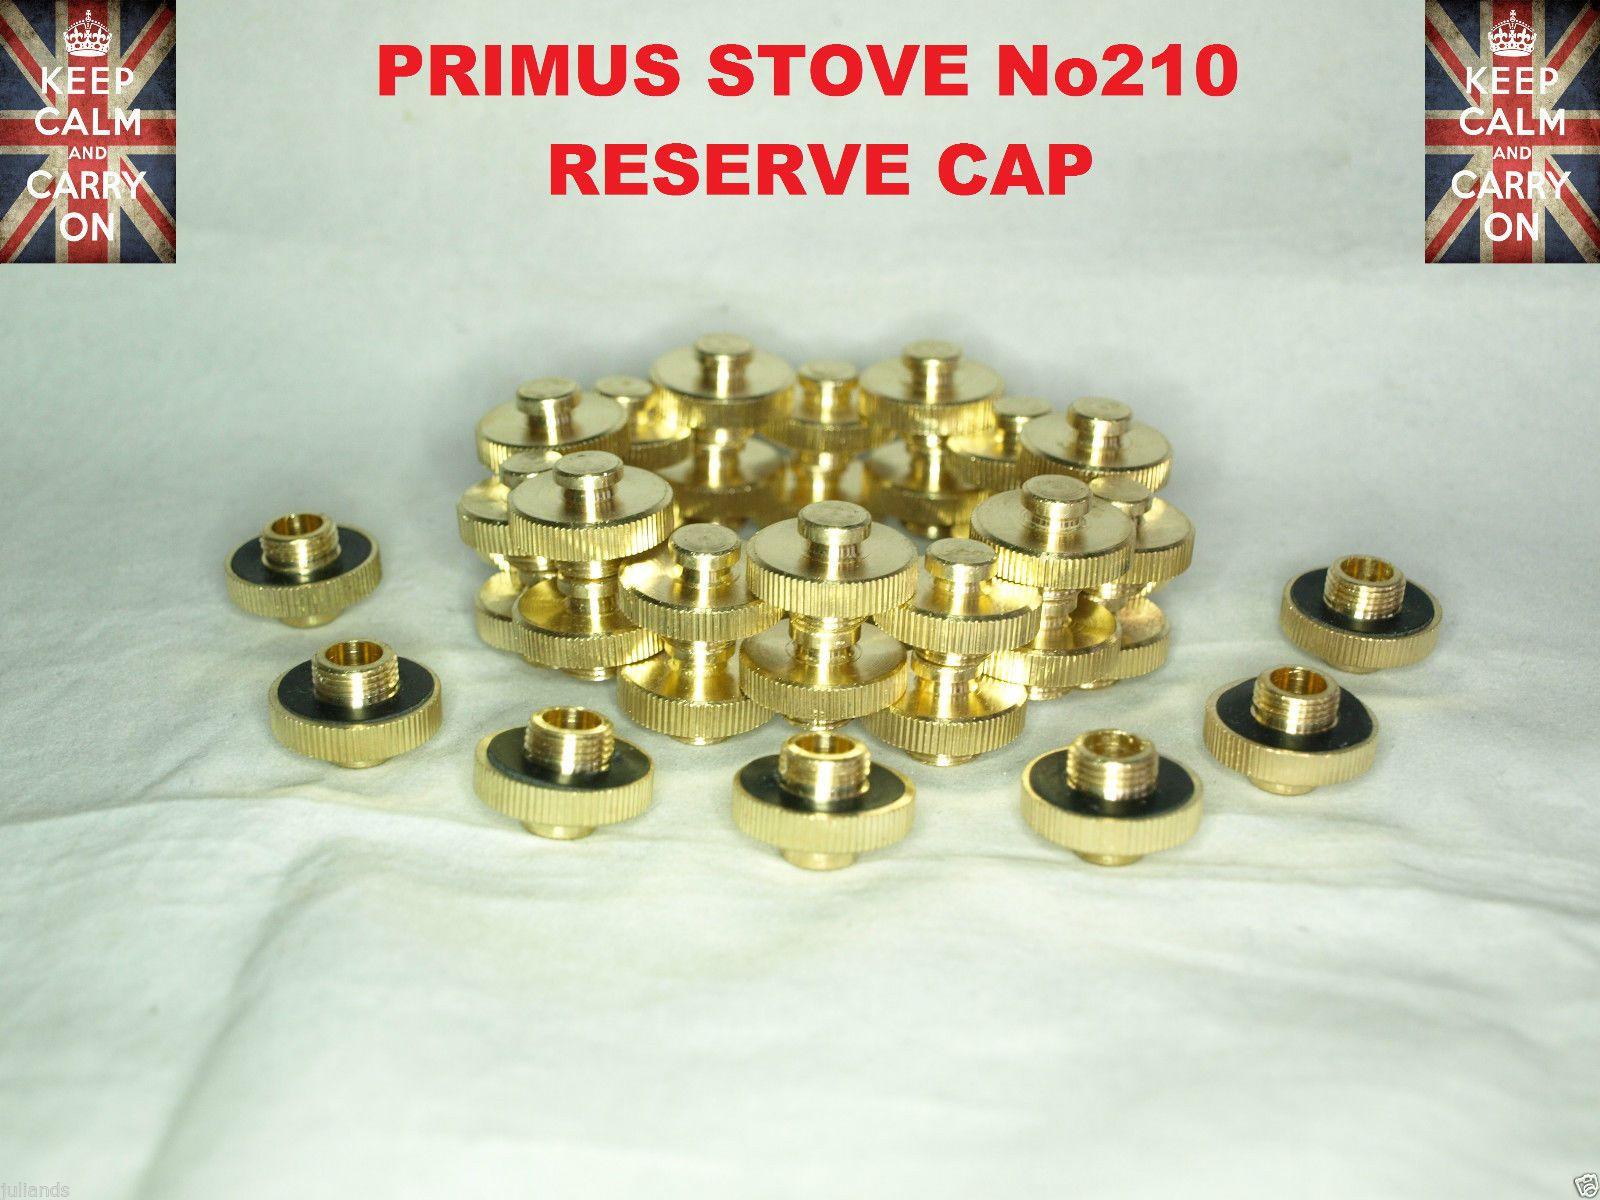 PRIMUS STOVE RESERVE CAP PARTS PARAFFIN STOVE KEROSENE STOVE SPARES